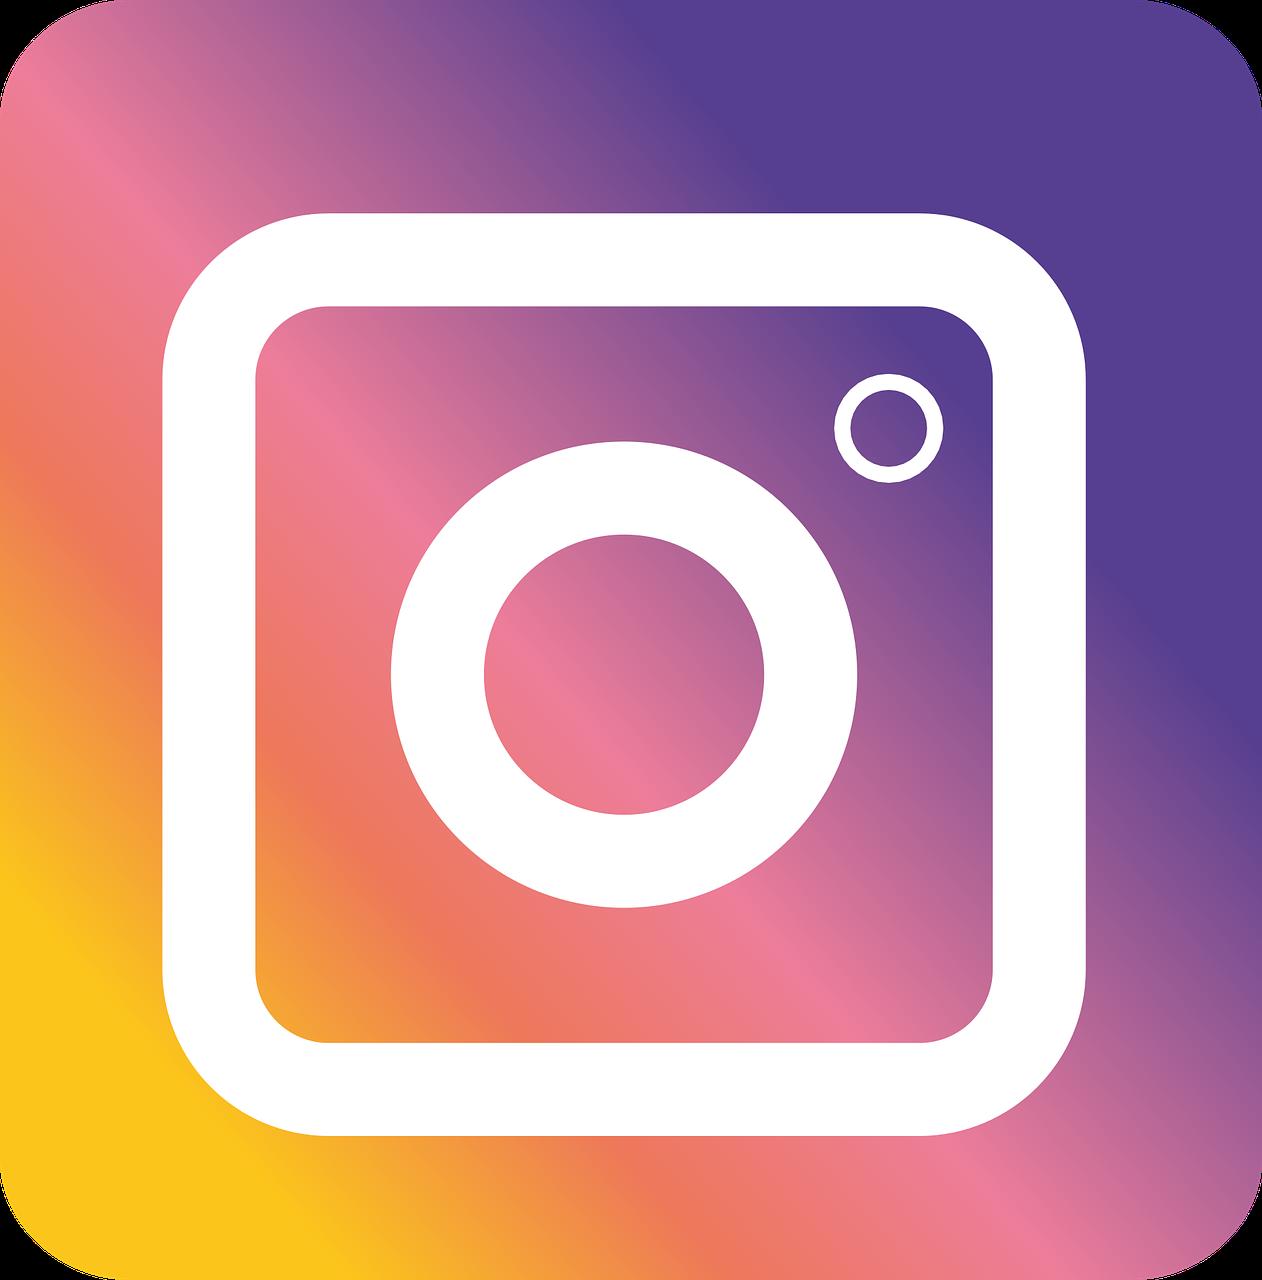 Rovert on Instagram